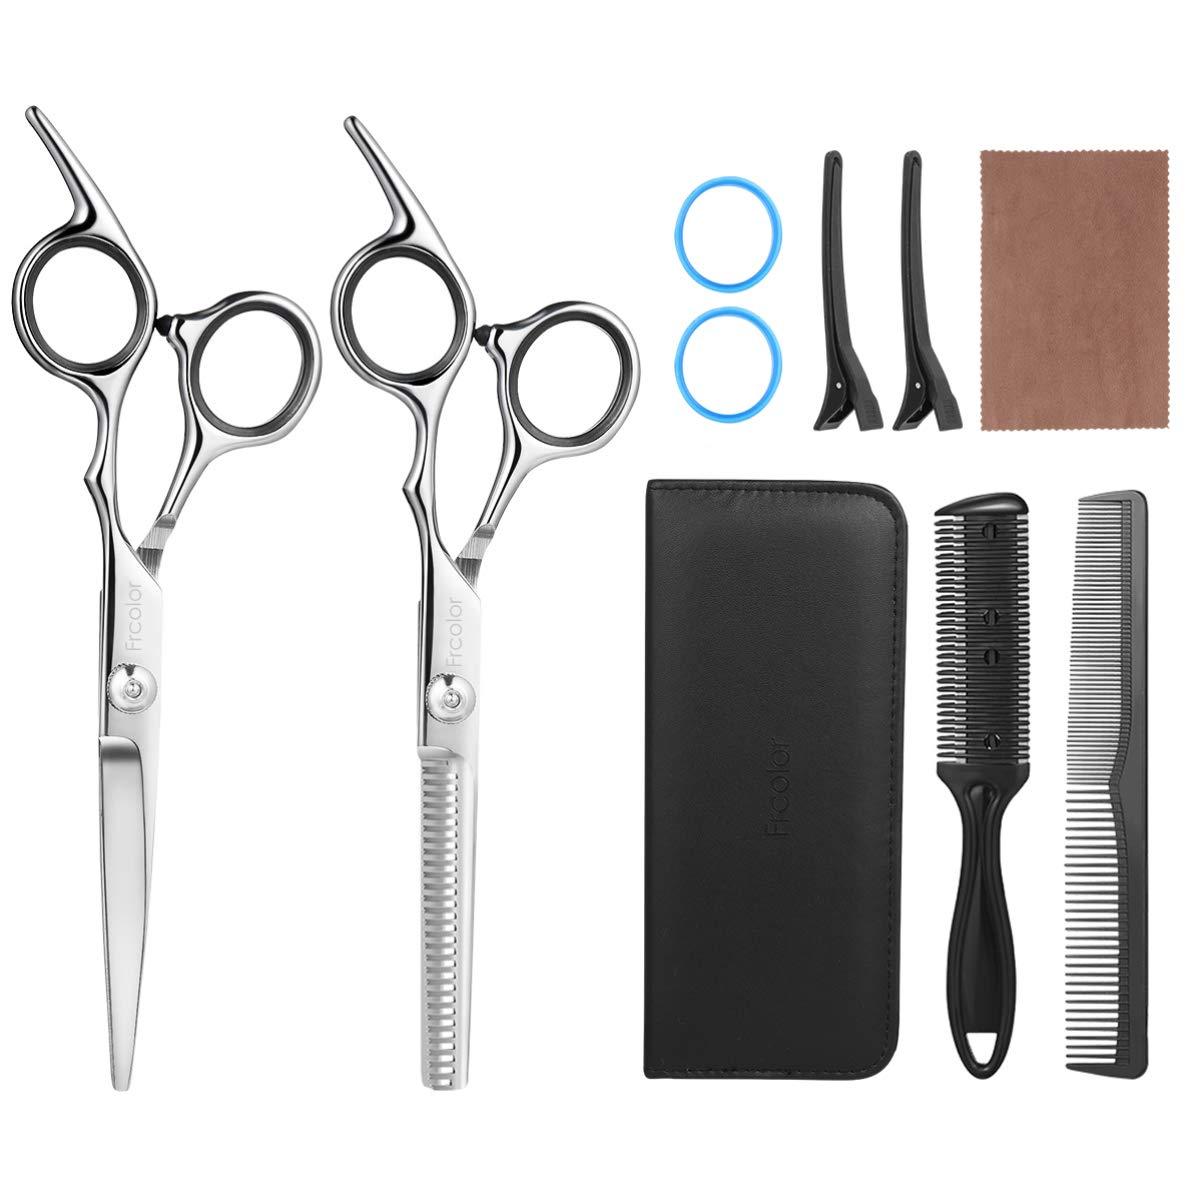 Hair Cutting Scissors Set, Professional Hair Scissor Hairdressing Kit for Salon Home Use